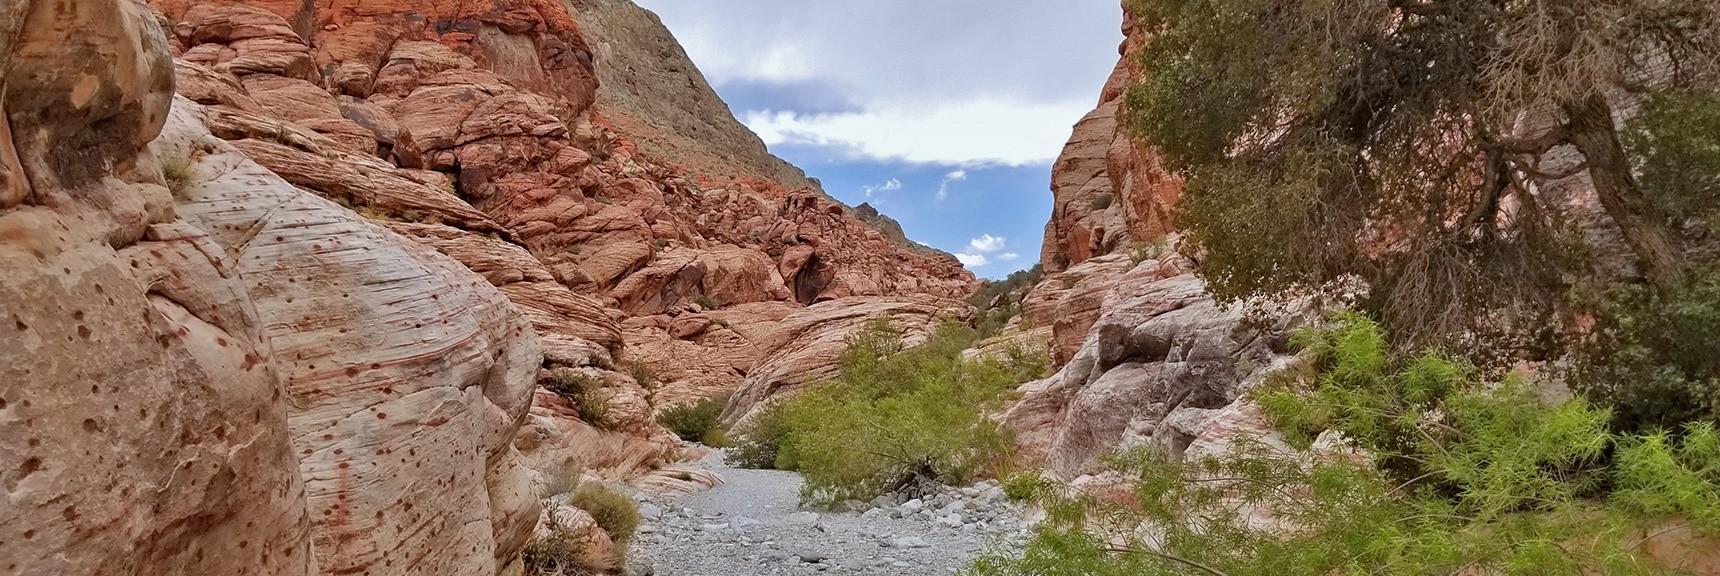 Back on Kraft Mountain Loop and Lower Gateway Canyon Trail | Kraft Mountain Loop | Calico Basin, Nevada